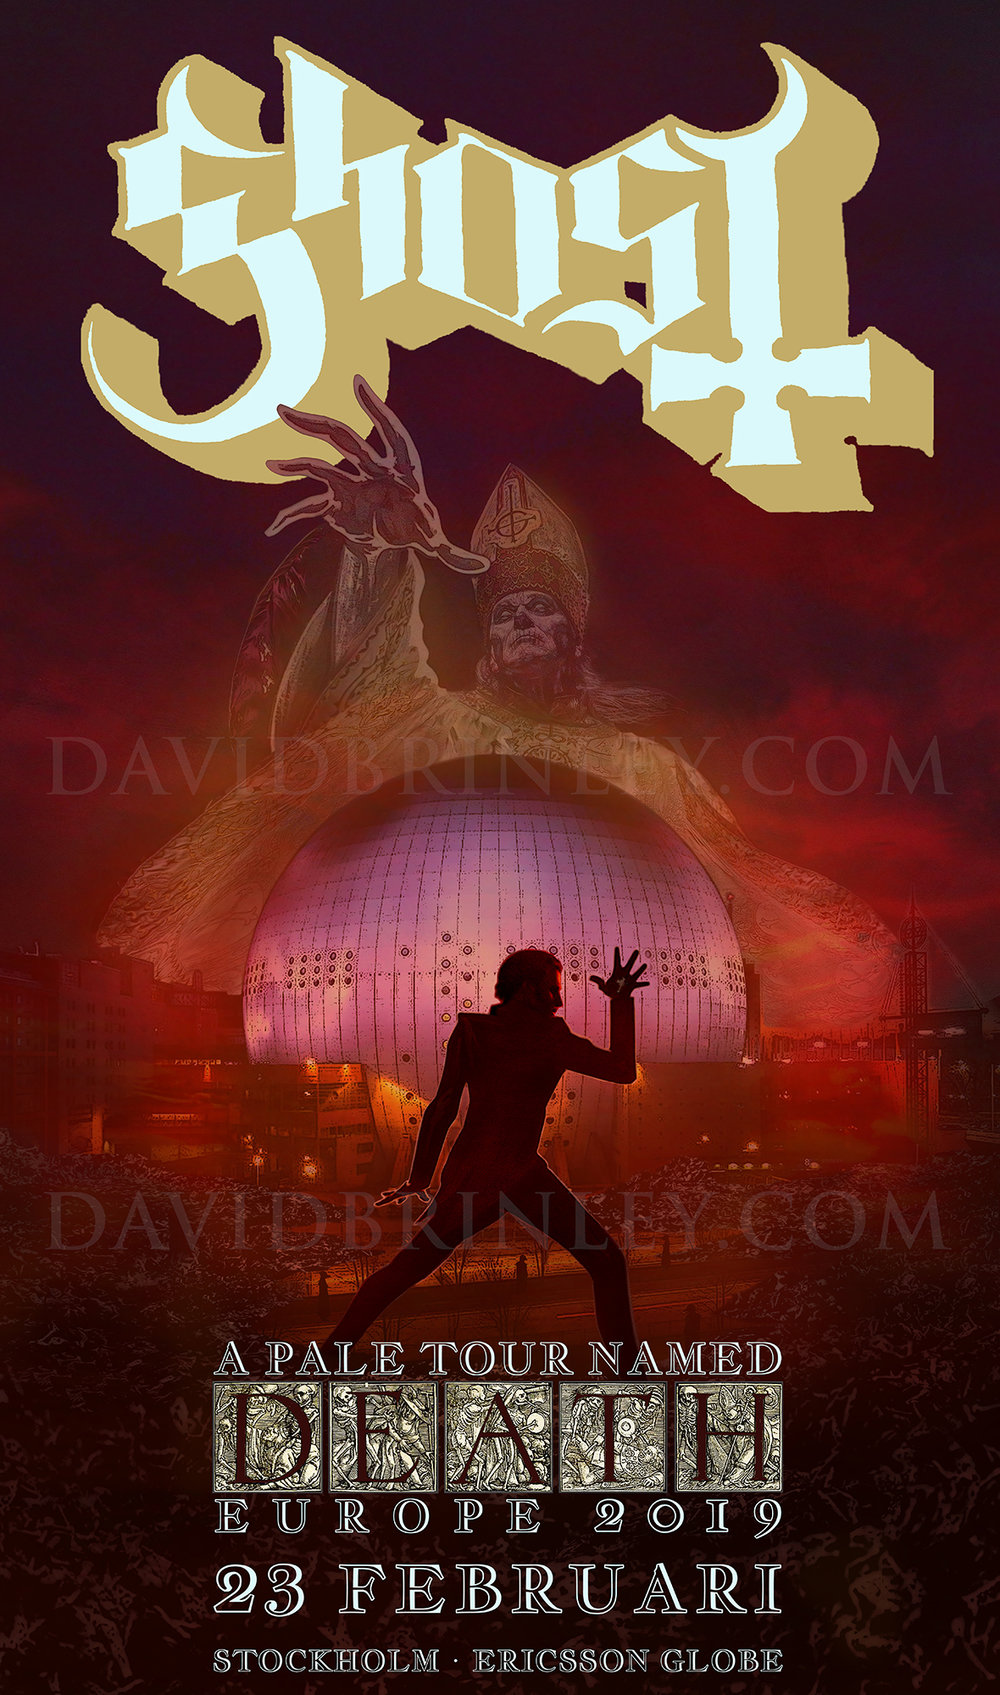 GHOST | Stockholm Sweden Ericsson Globe | February 23, 2019   A Pale Tour Named Death Official poster  David M. Brinley | Illustrator Designer  Acrylic and Digital